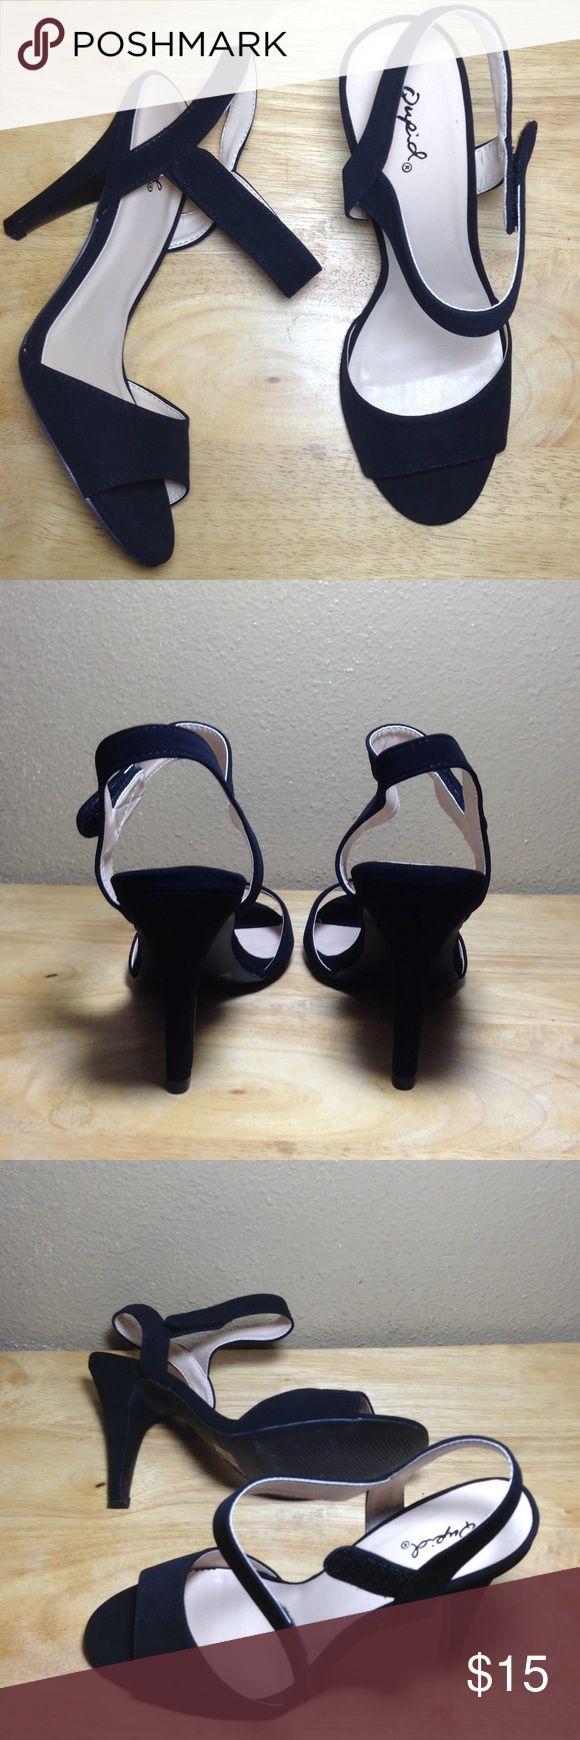 Black suede-like heels velcro strap size 9 Black suede-like high heels with Velcro strap. Size 9 Shoes Heels